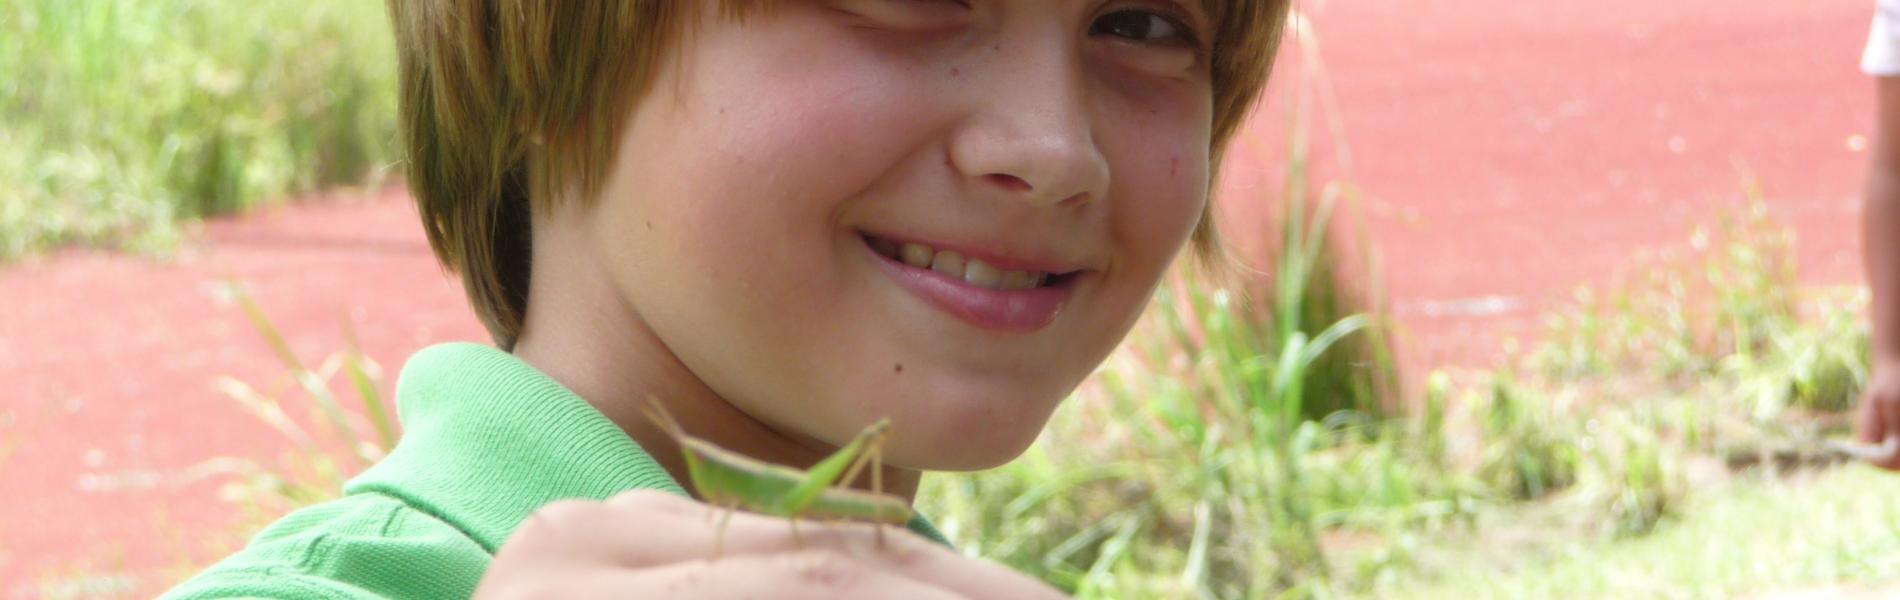 Child with grashopper